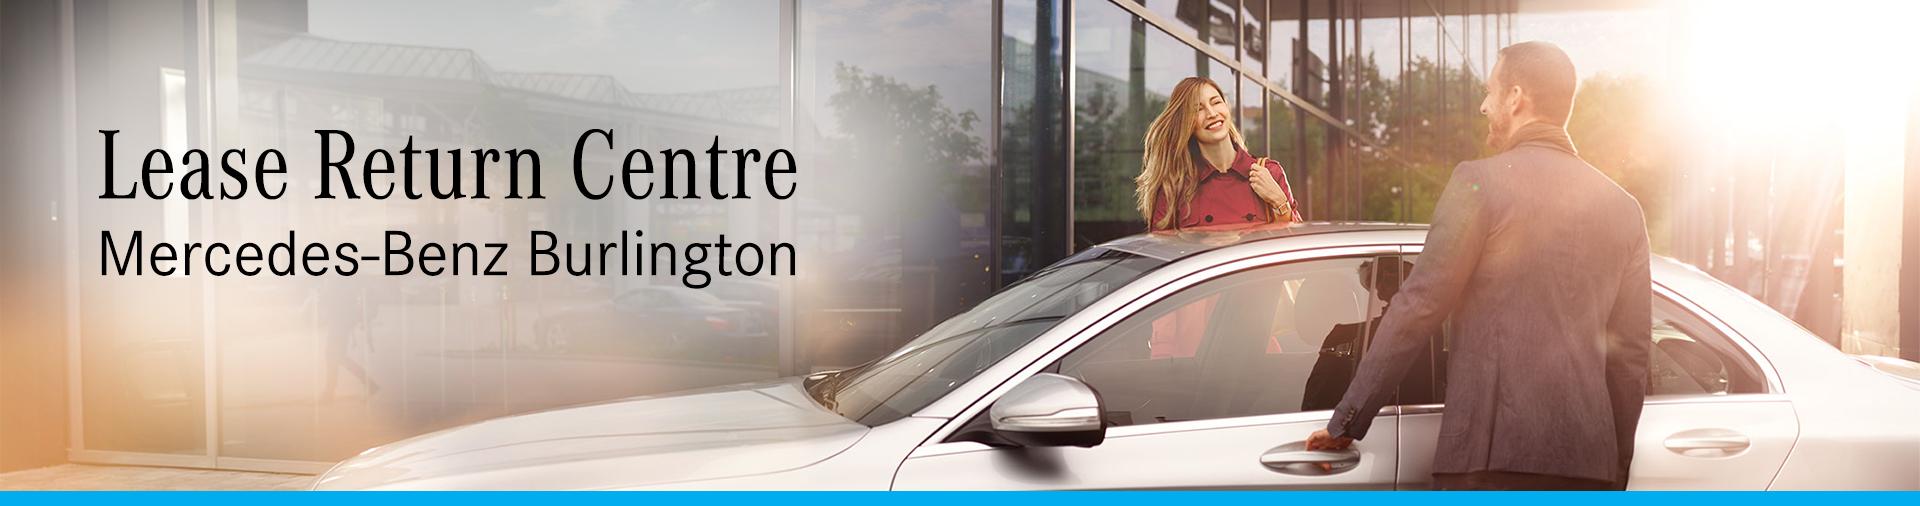 Lease Return Centre at Mercedes-Benz Burlington header